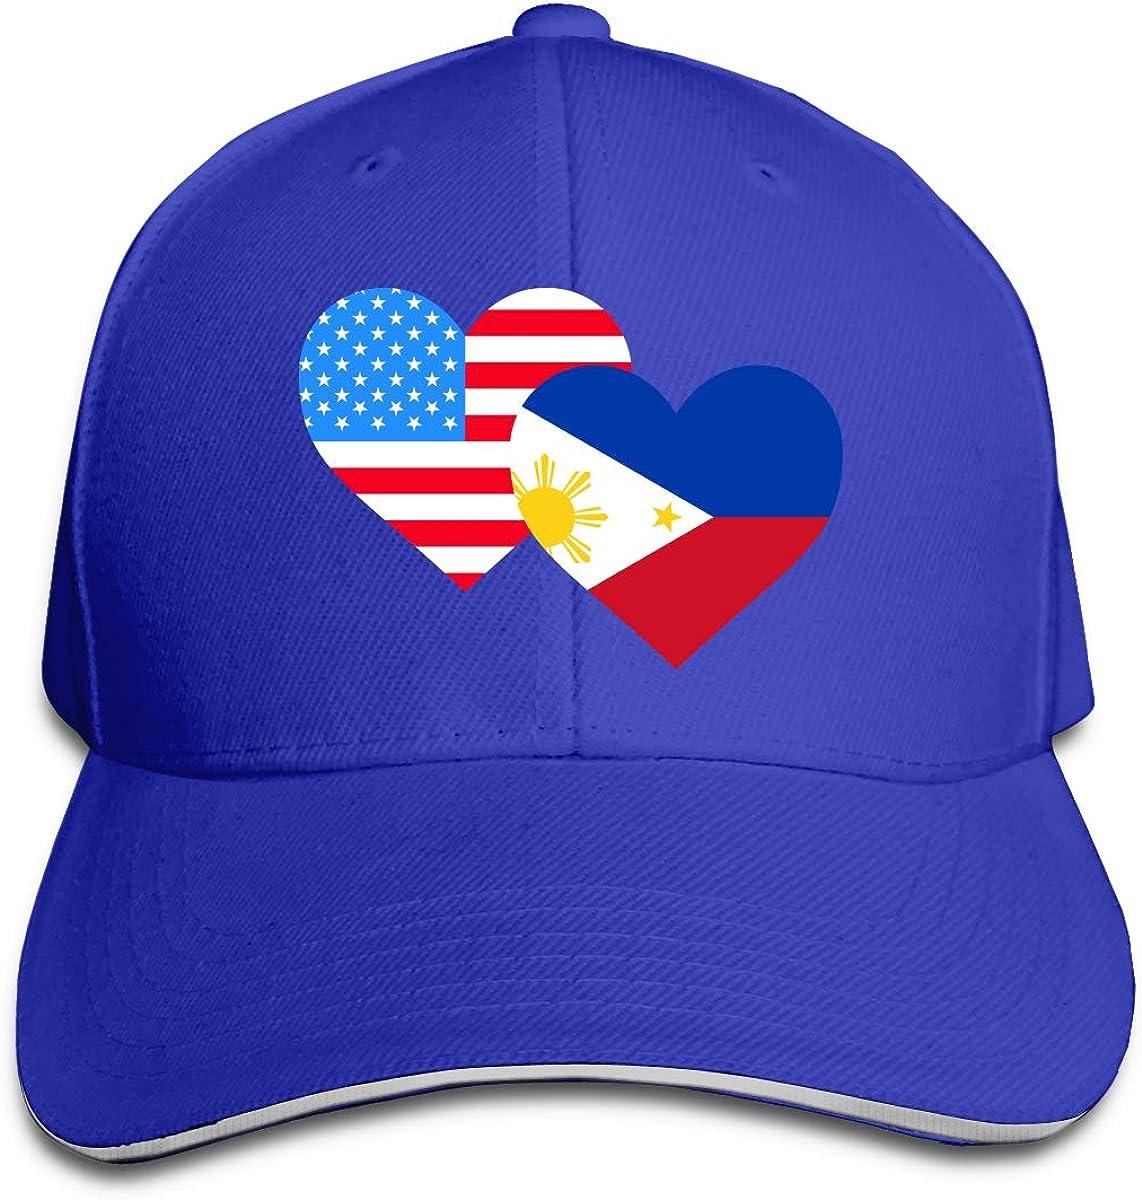 JustQbob1 American Philippines Heart Flag Outdoor Snapback Sandwich Cap Adjustable Baseball Hat Hip Hop Hat